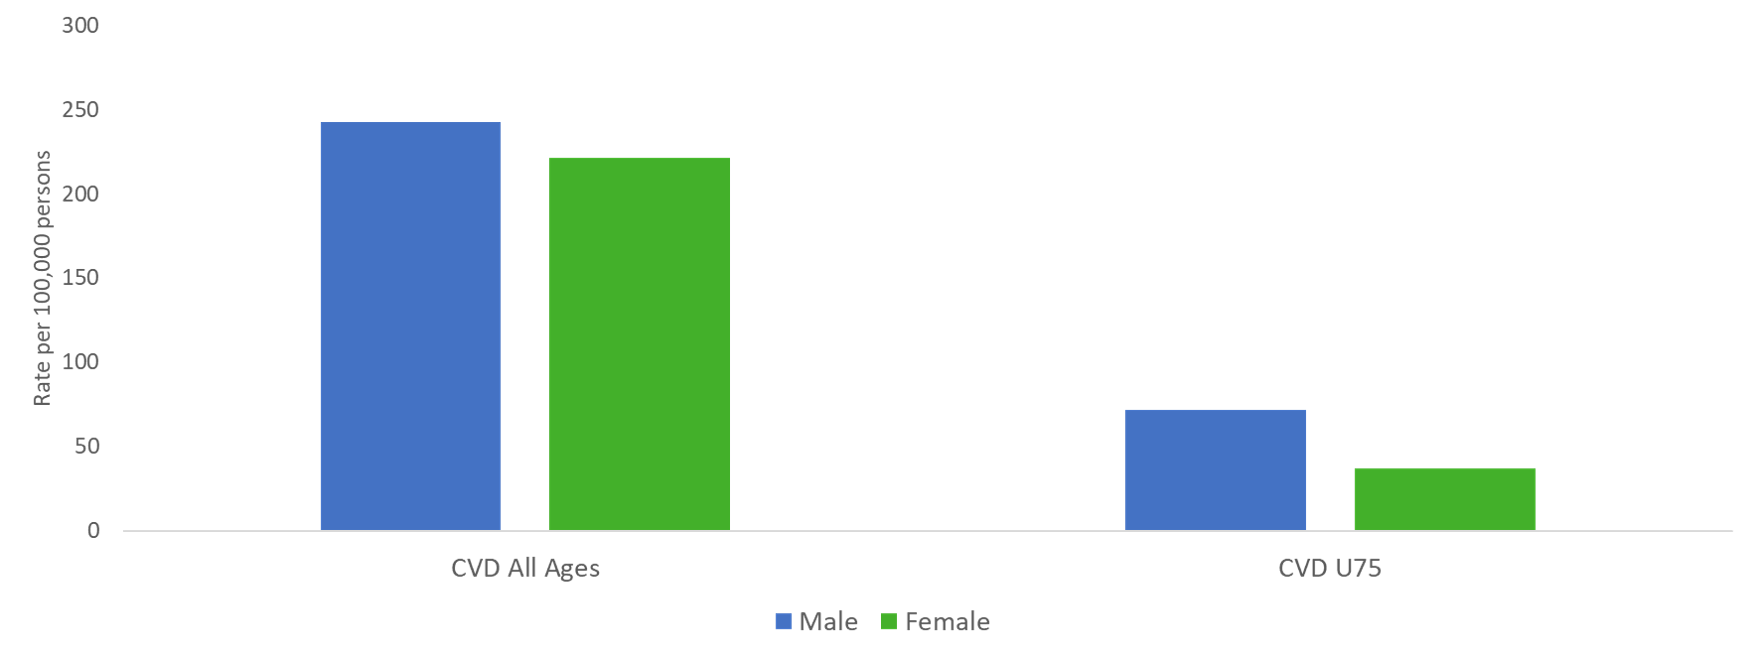 CVD mortality by gender